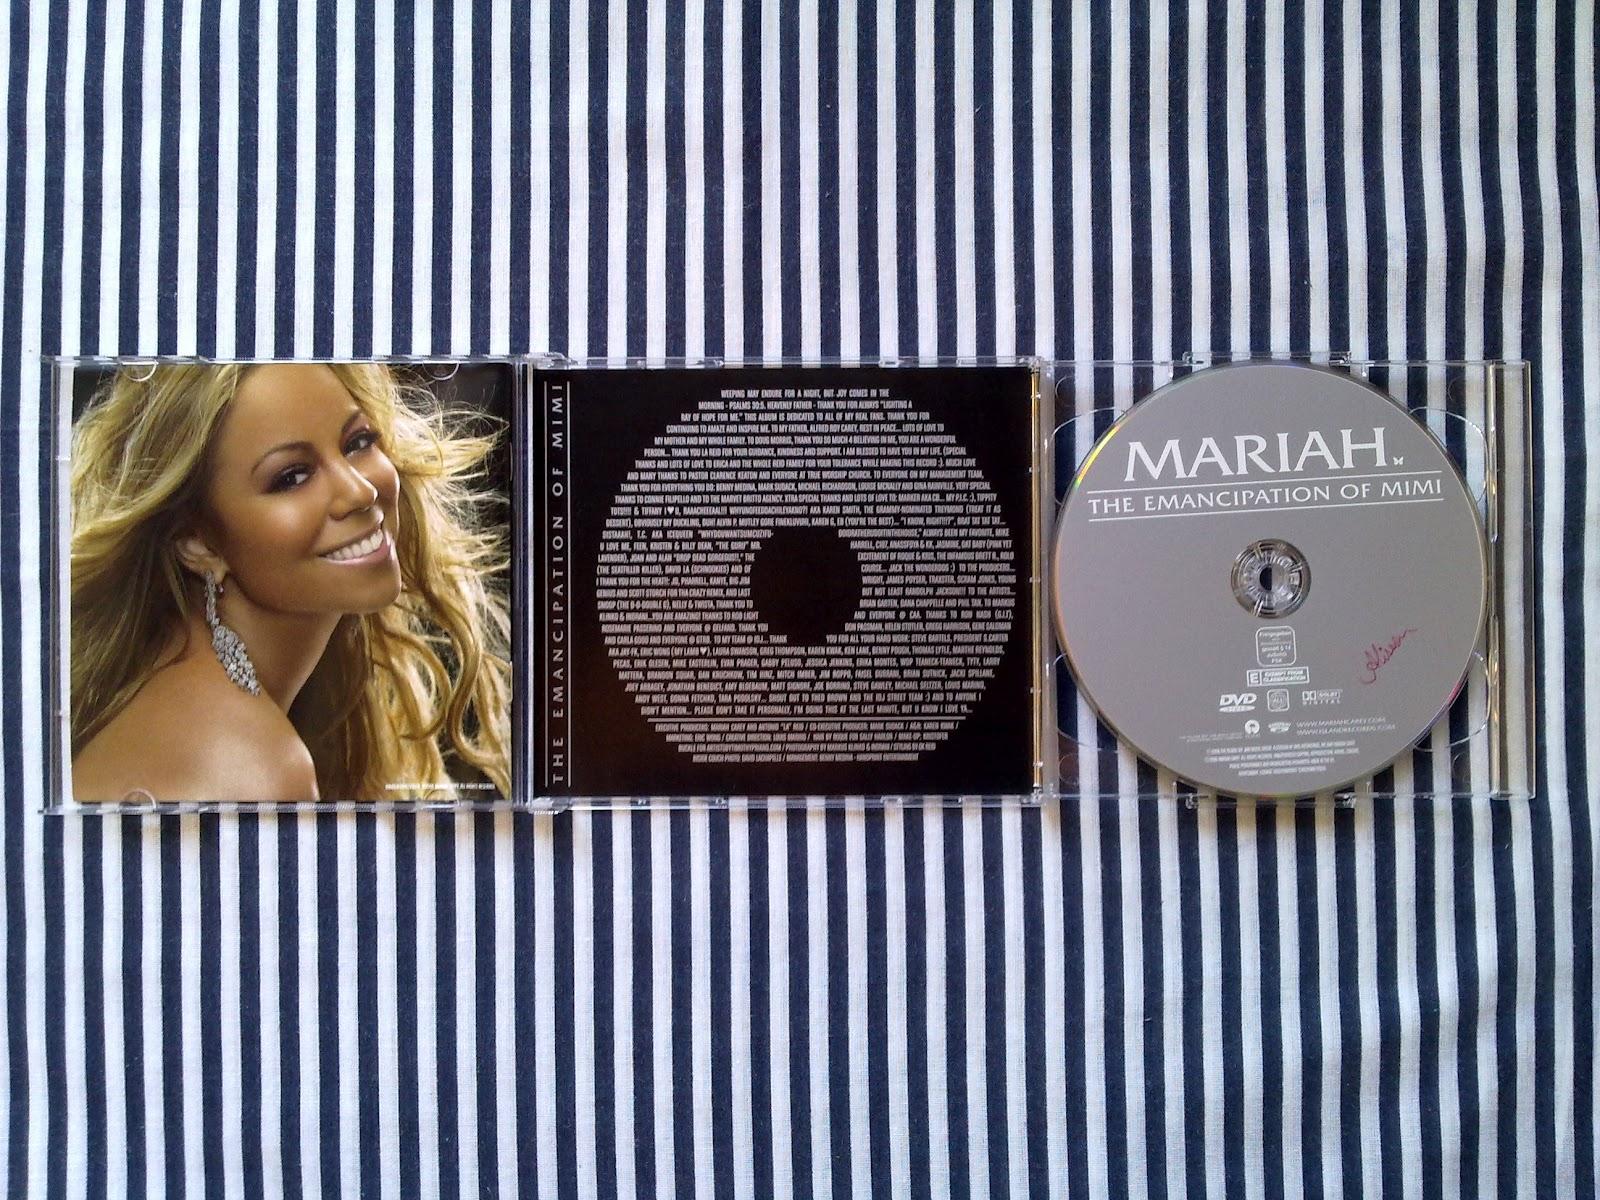 mariah carey the emancipation of mimi ultra platinum edition